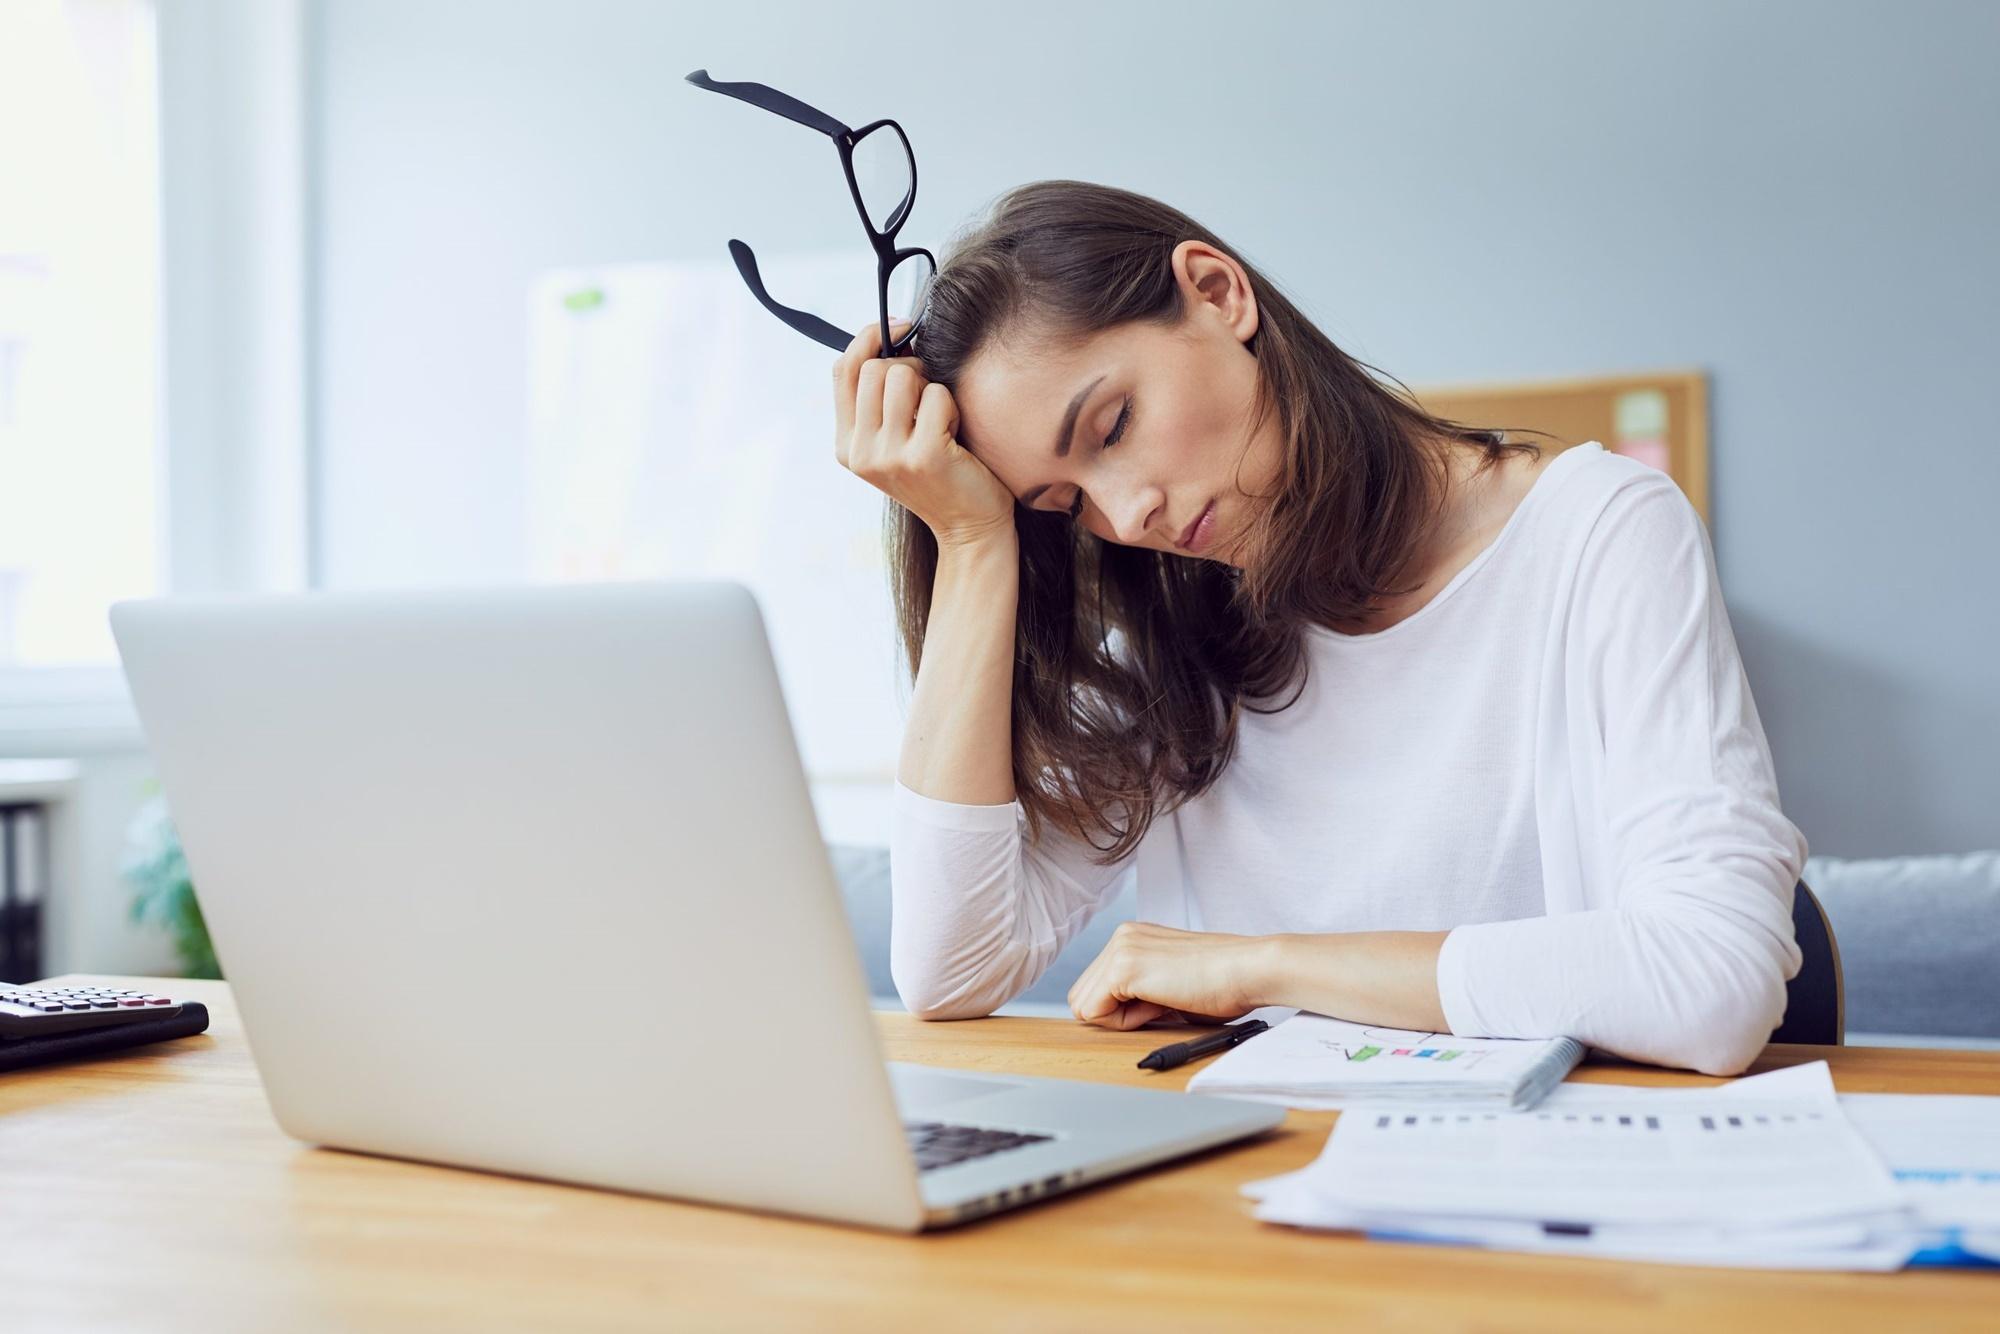 Enxaqueca entenda seu impacto no ambiente de trabalho